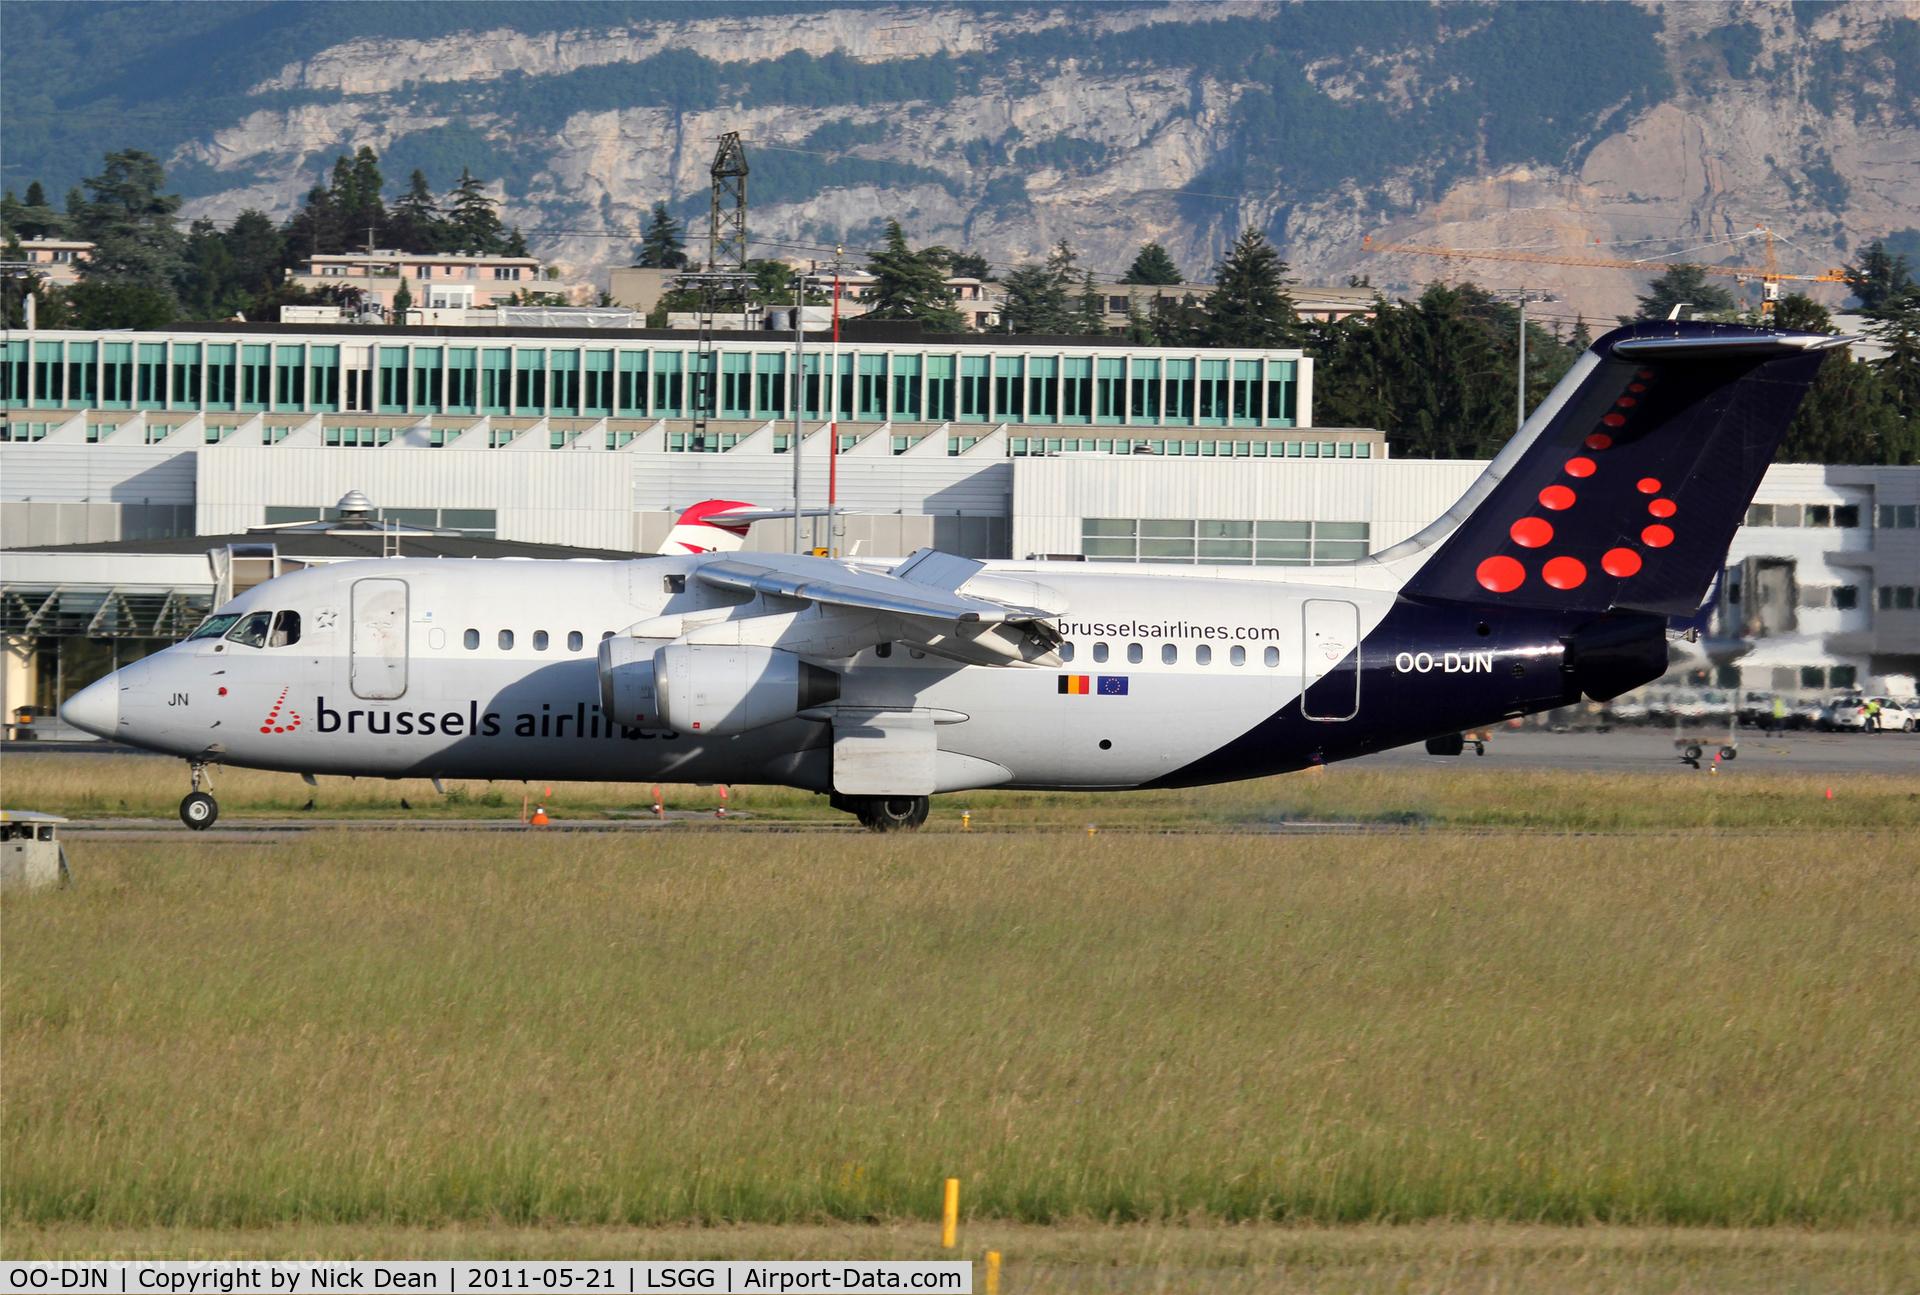 OO-DJN, 1995 British Aerospace Avro 146-RJ85 C/N E.2275, LSGG/GVA